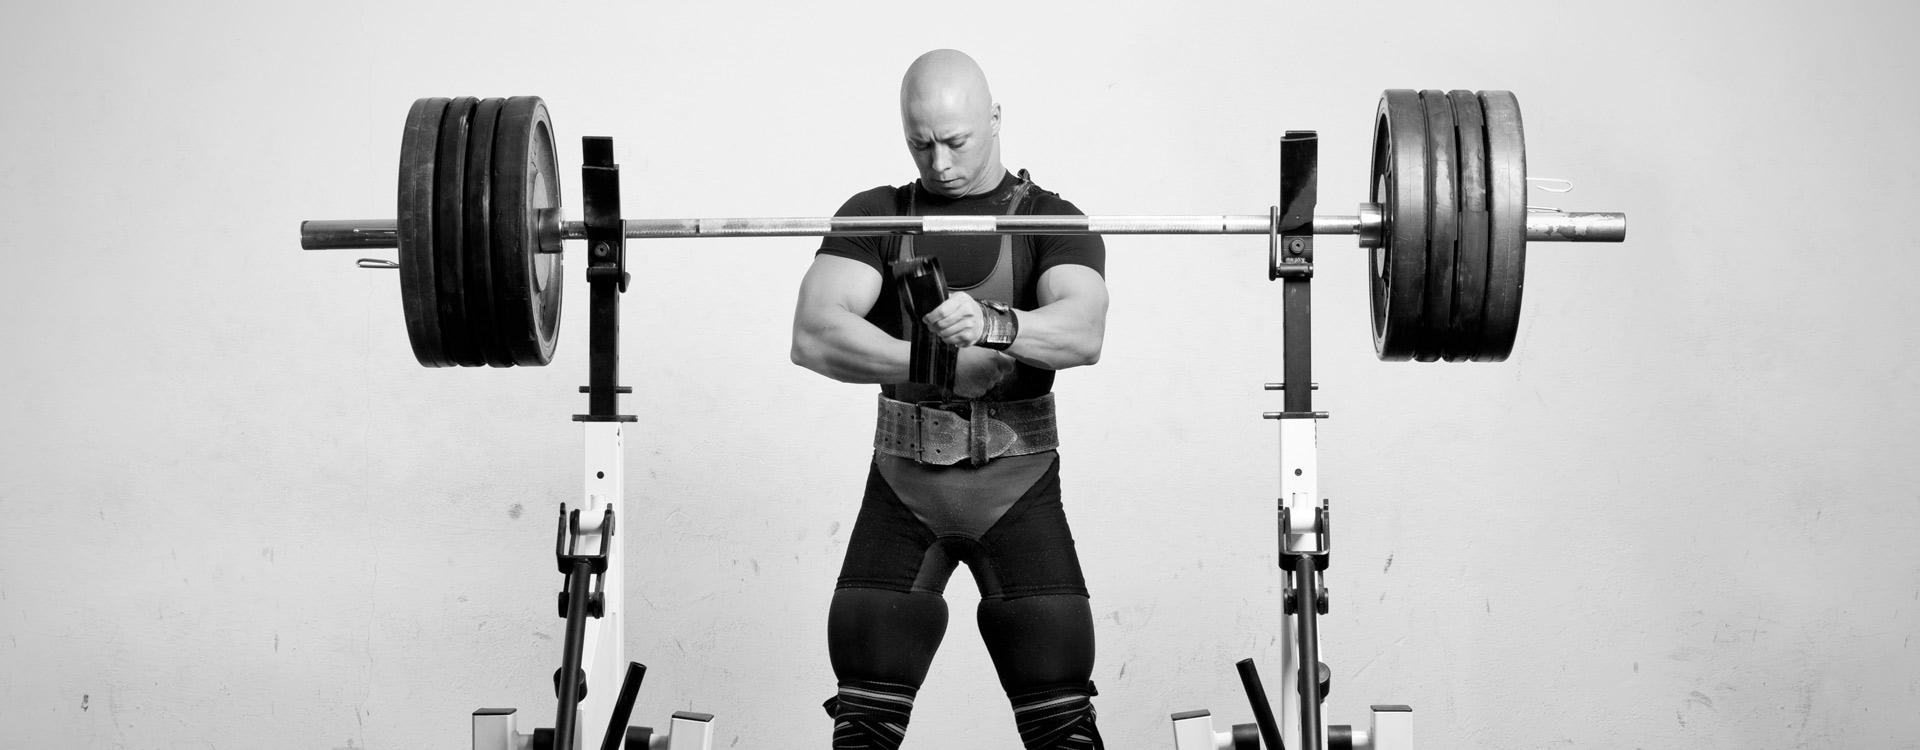 weightlifting rimini